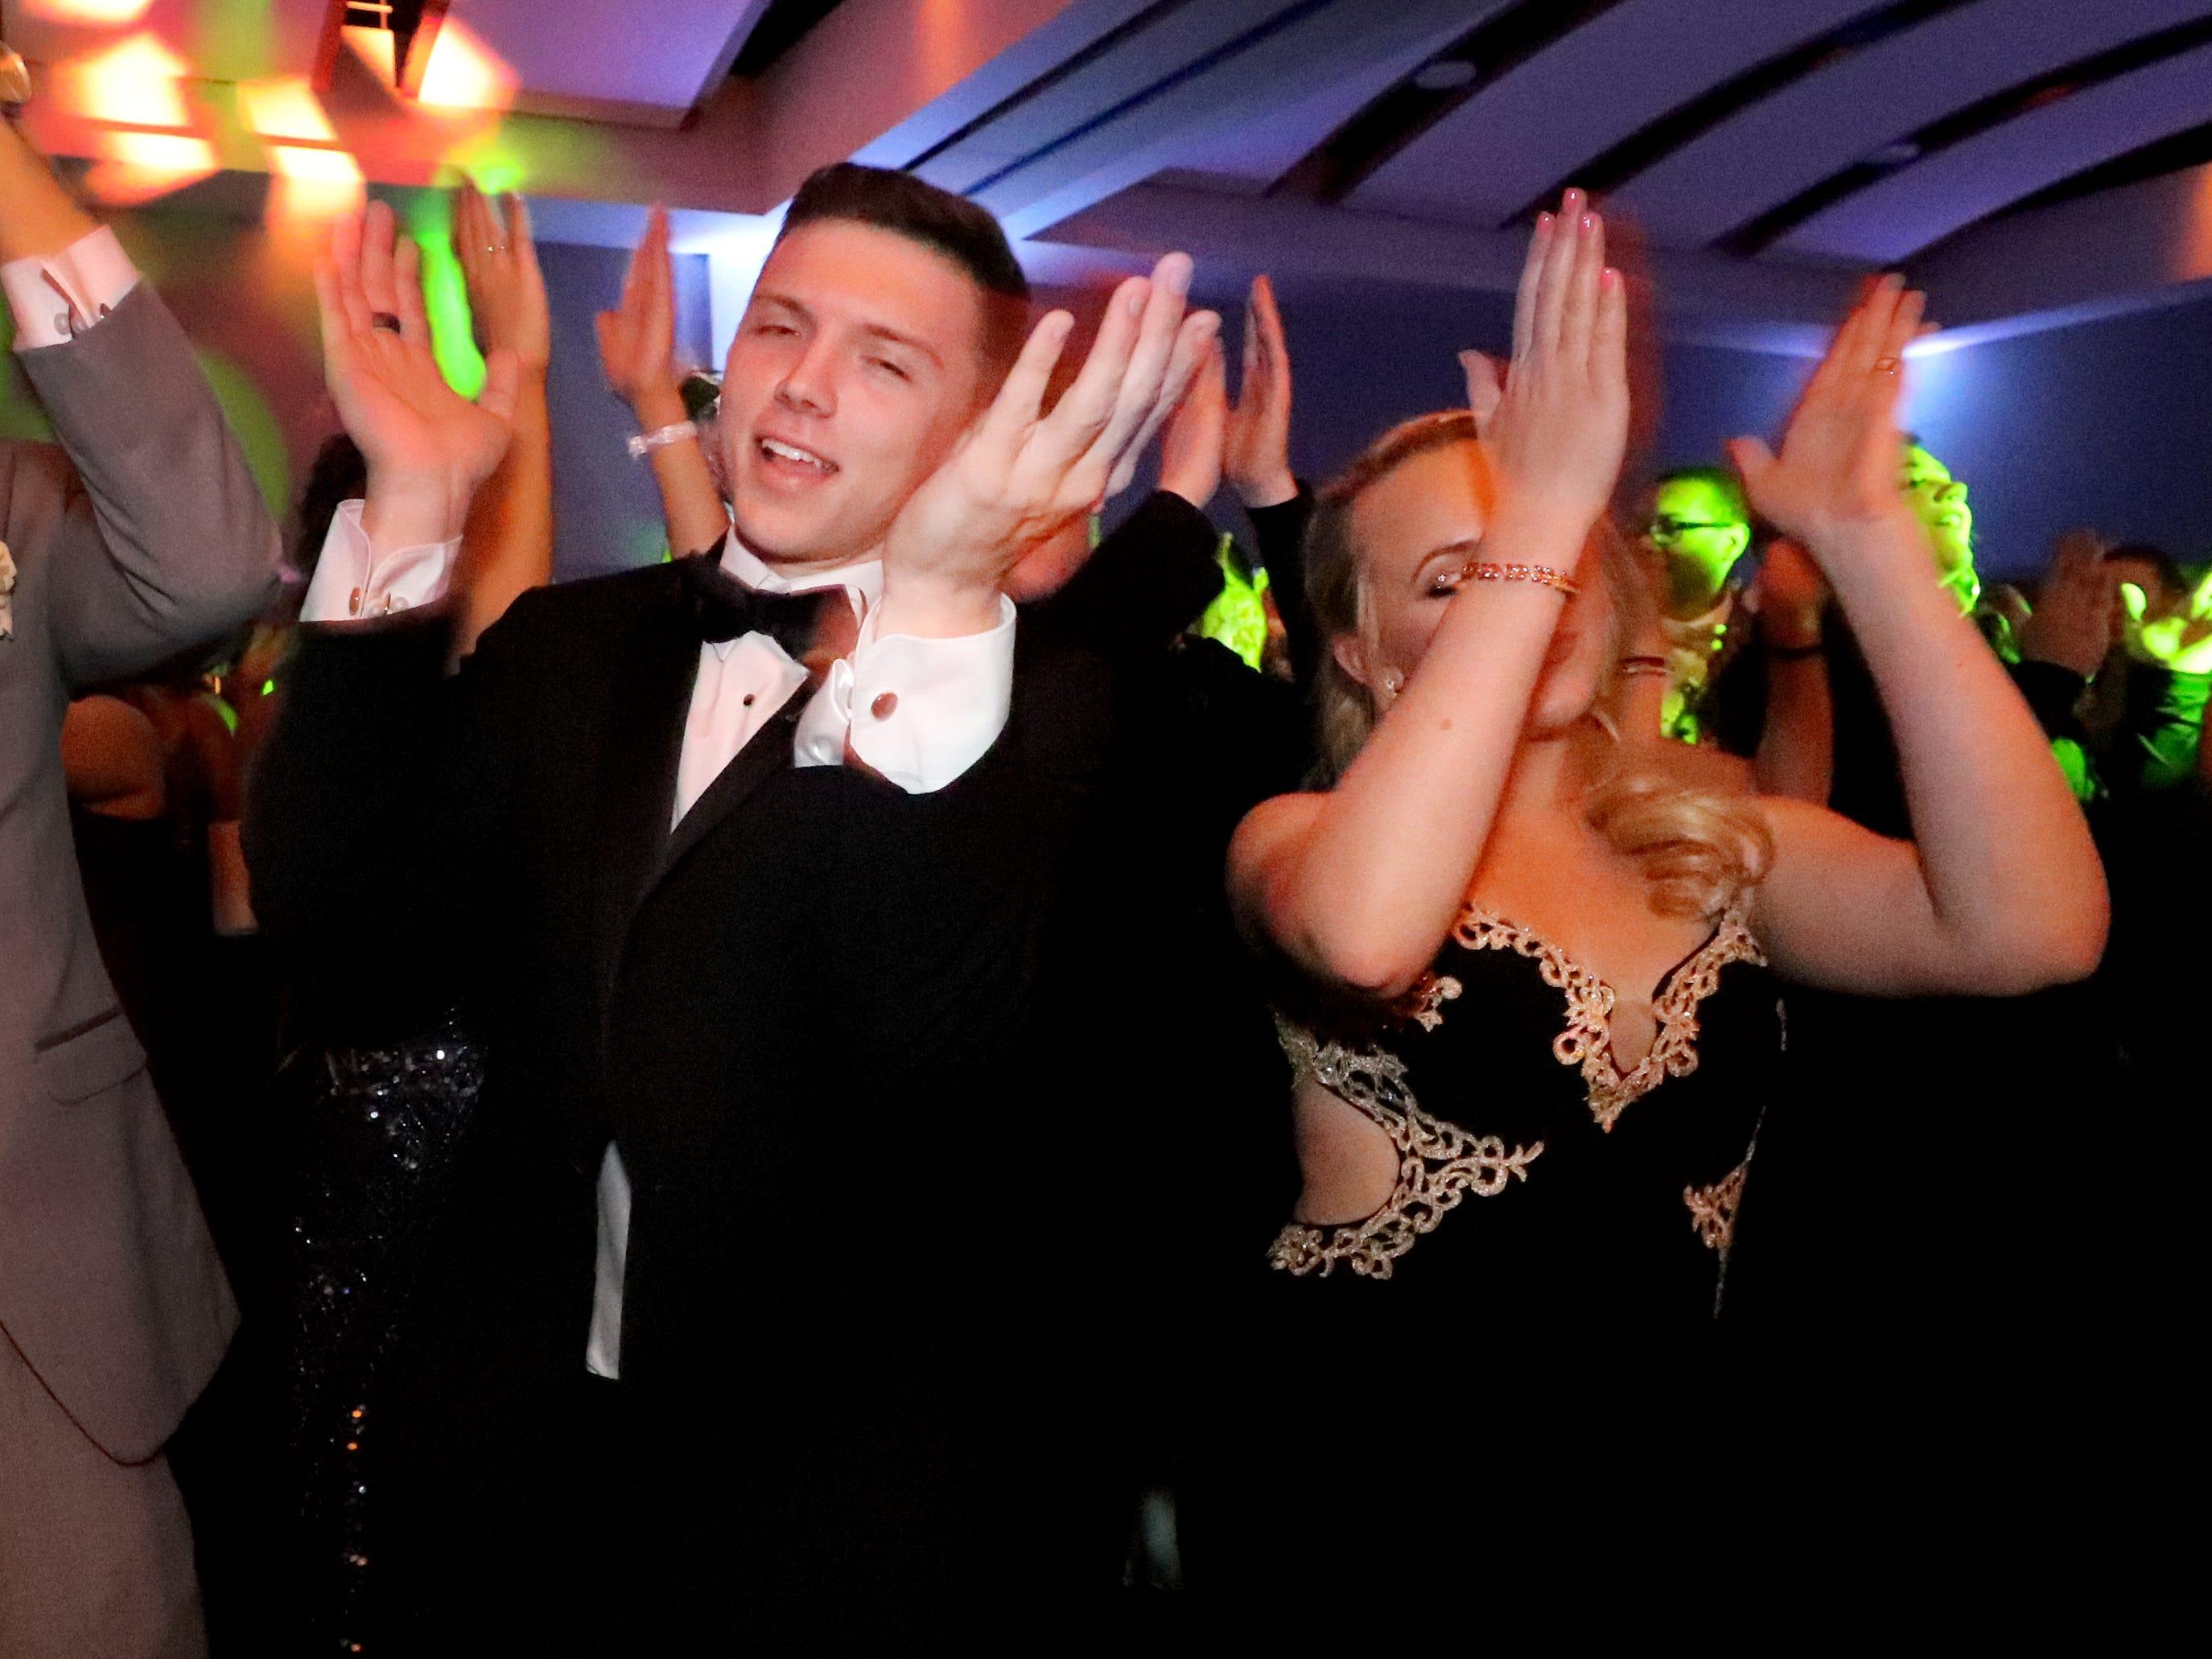 Jacob Spence left and Svetlana Baranova, right  dance at Blackman's prom on Friday April 12, 2019, at MTSU.